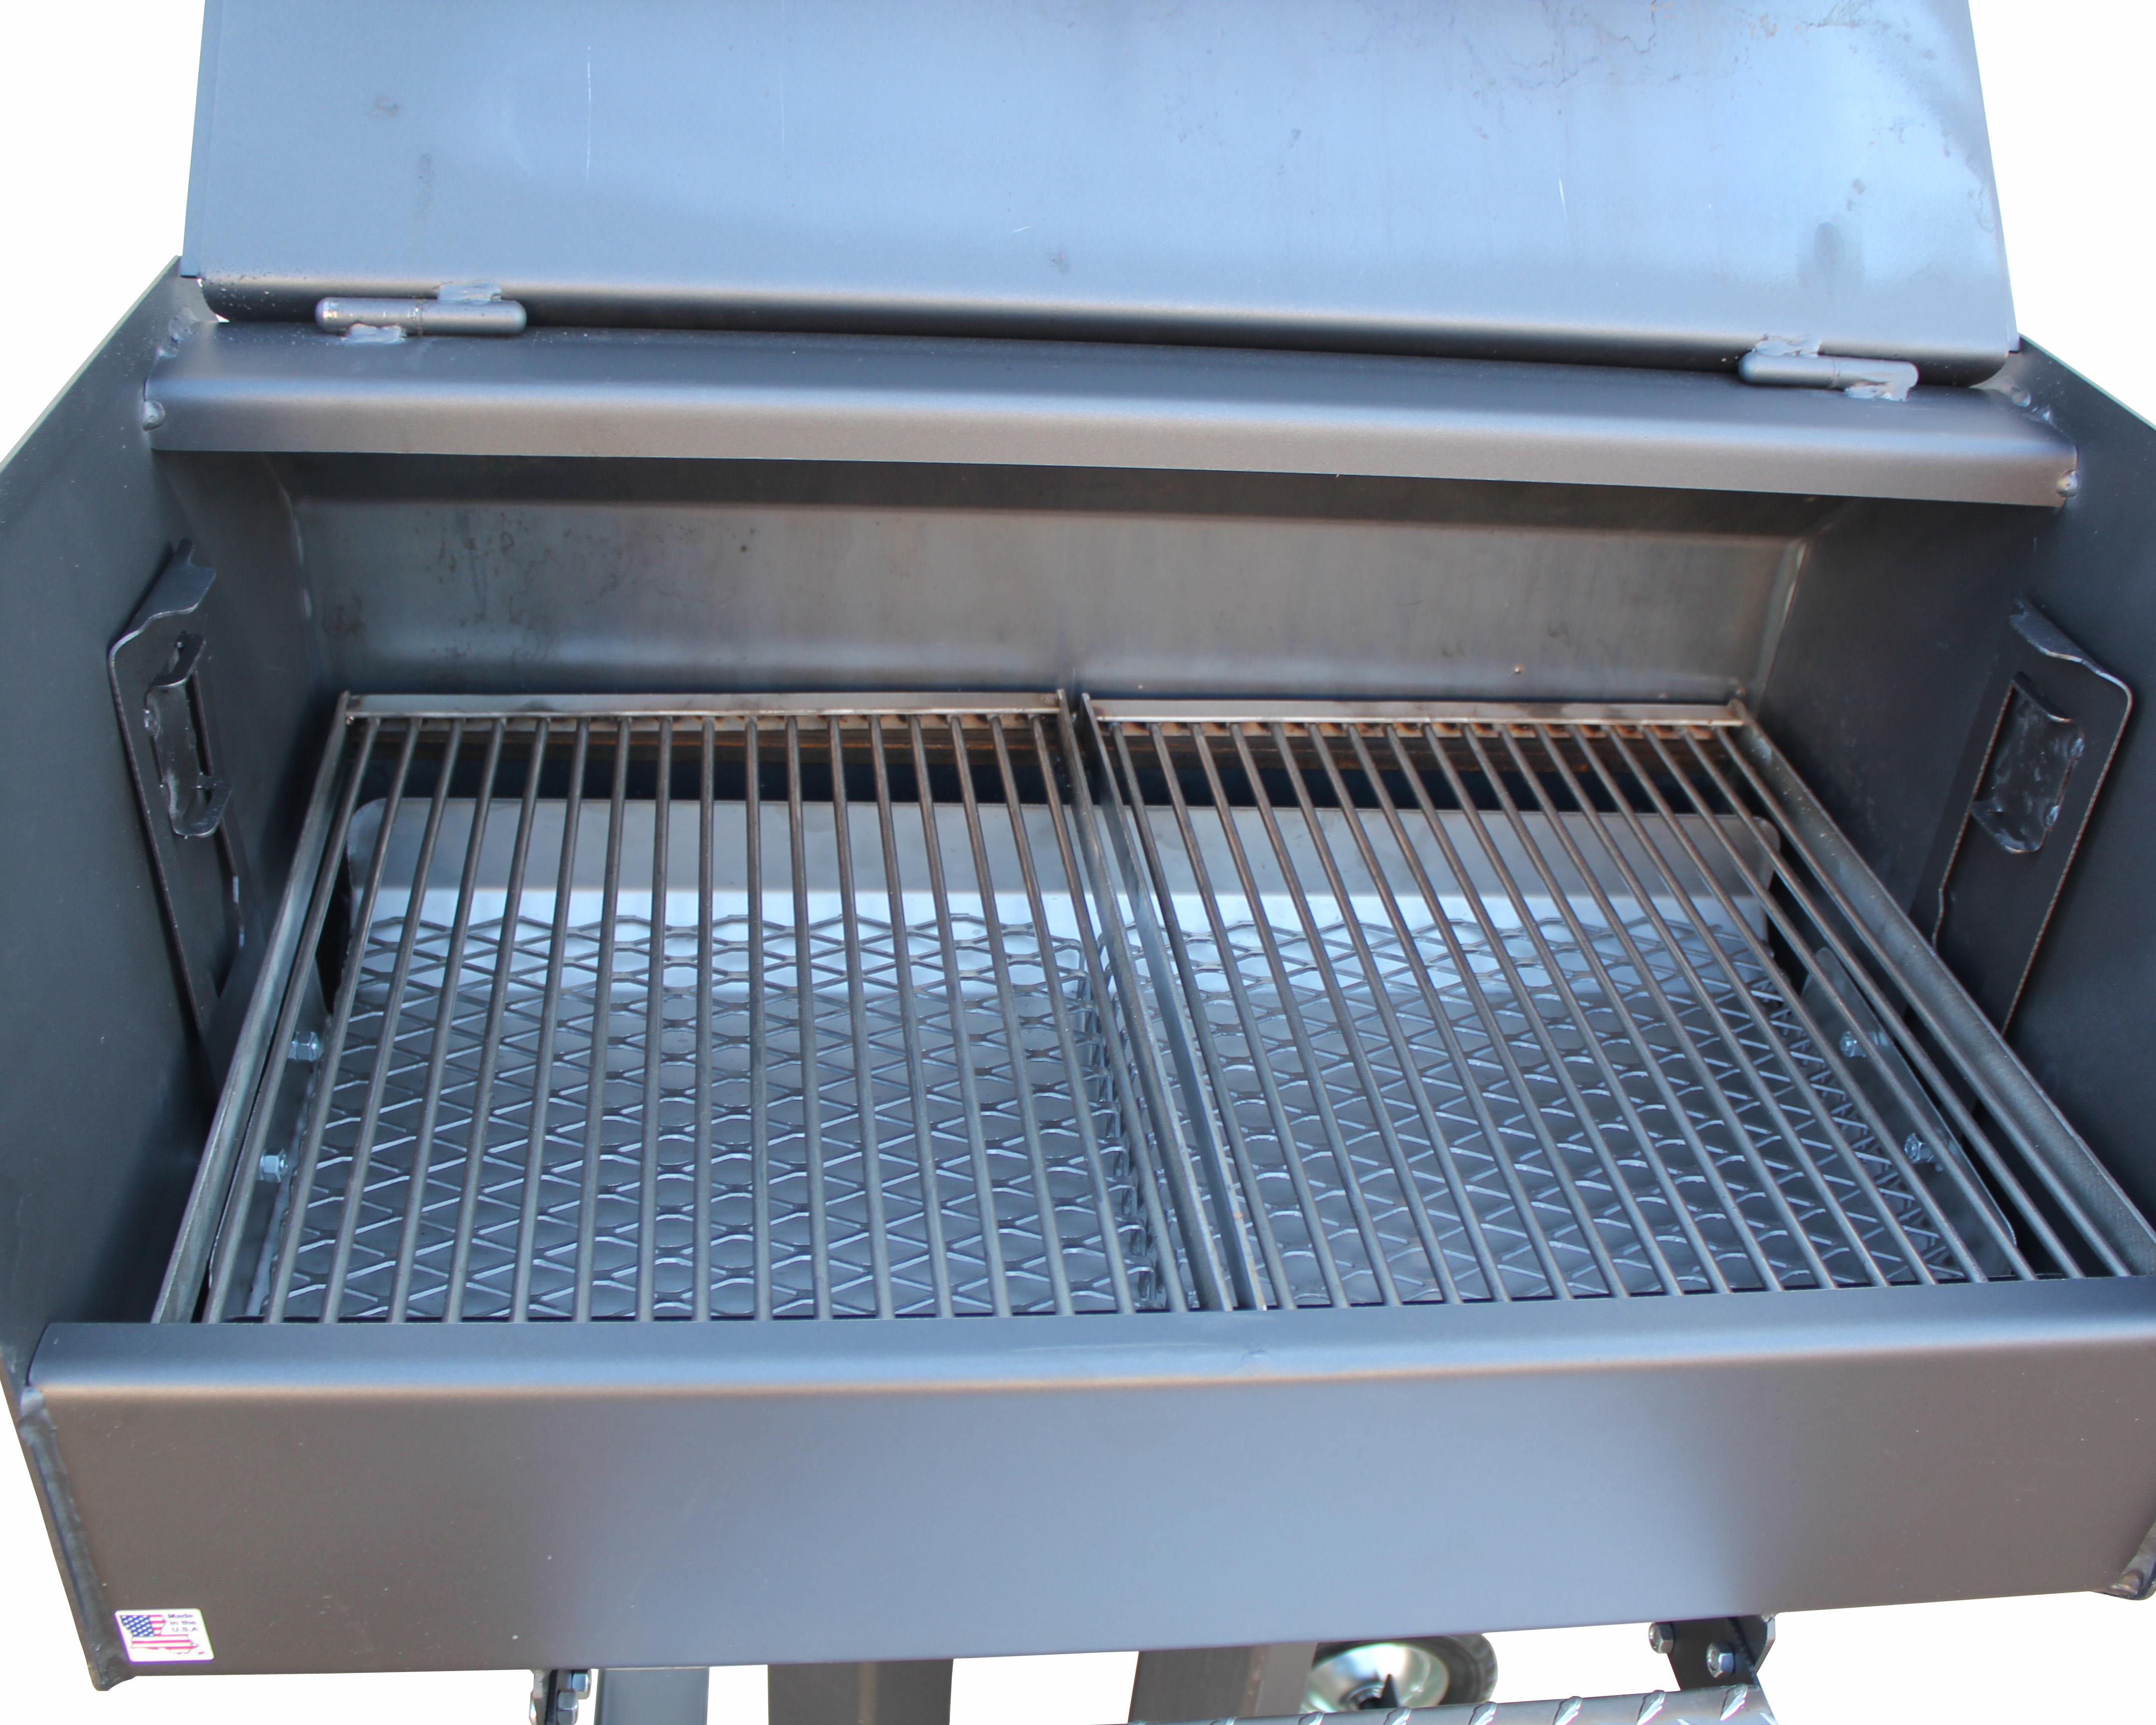 wid iron roadtrip swaptop coleman grate hei cast rack grill